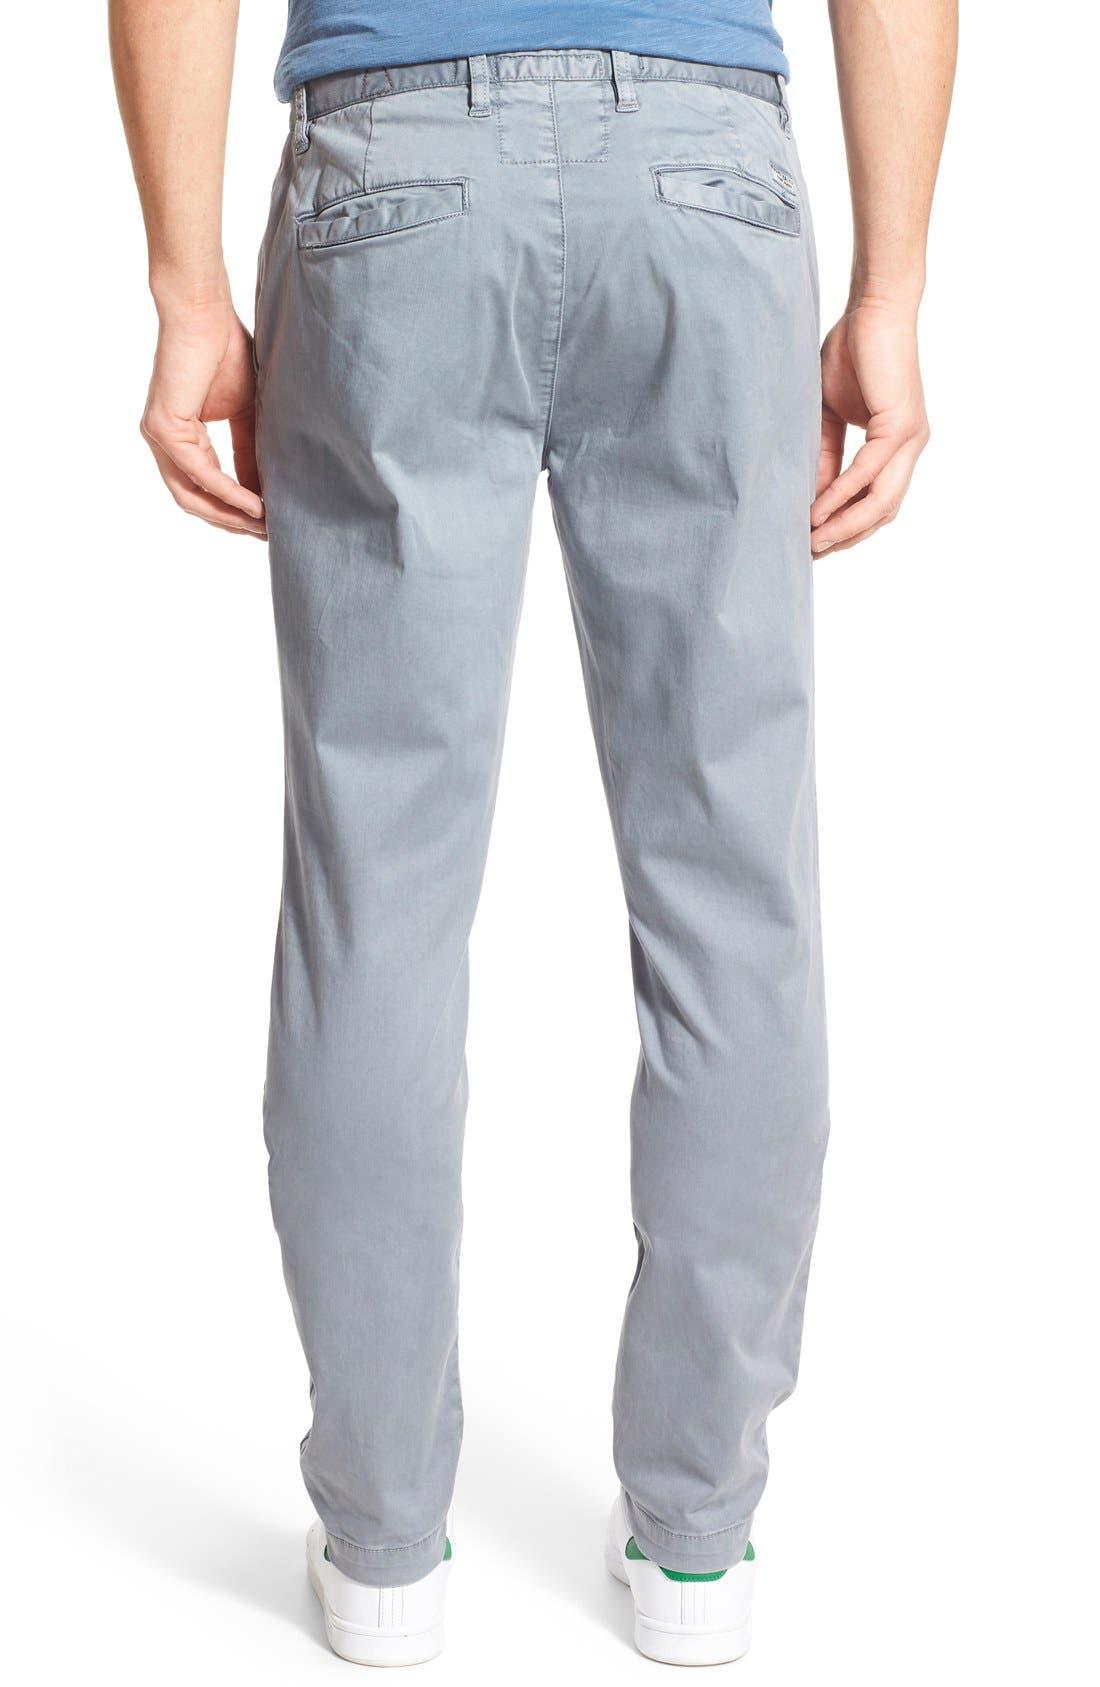 'Richmond' Chino Pants,                             Alternate thumbnail 3, color,                             020